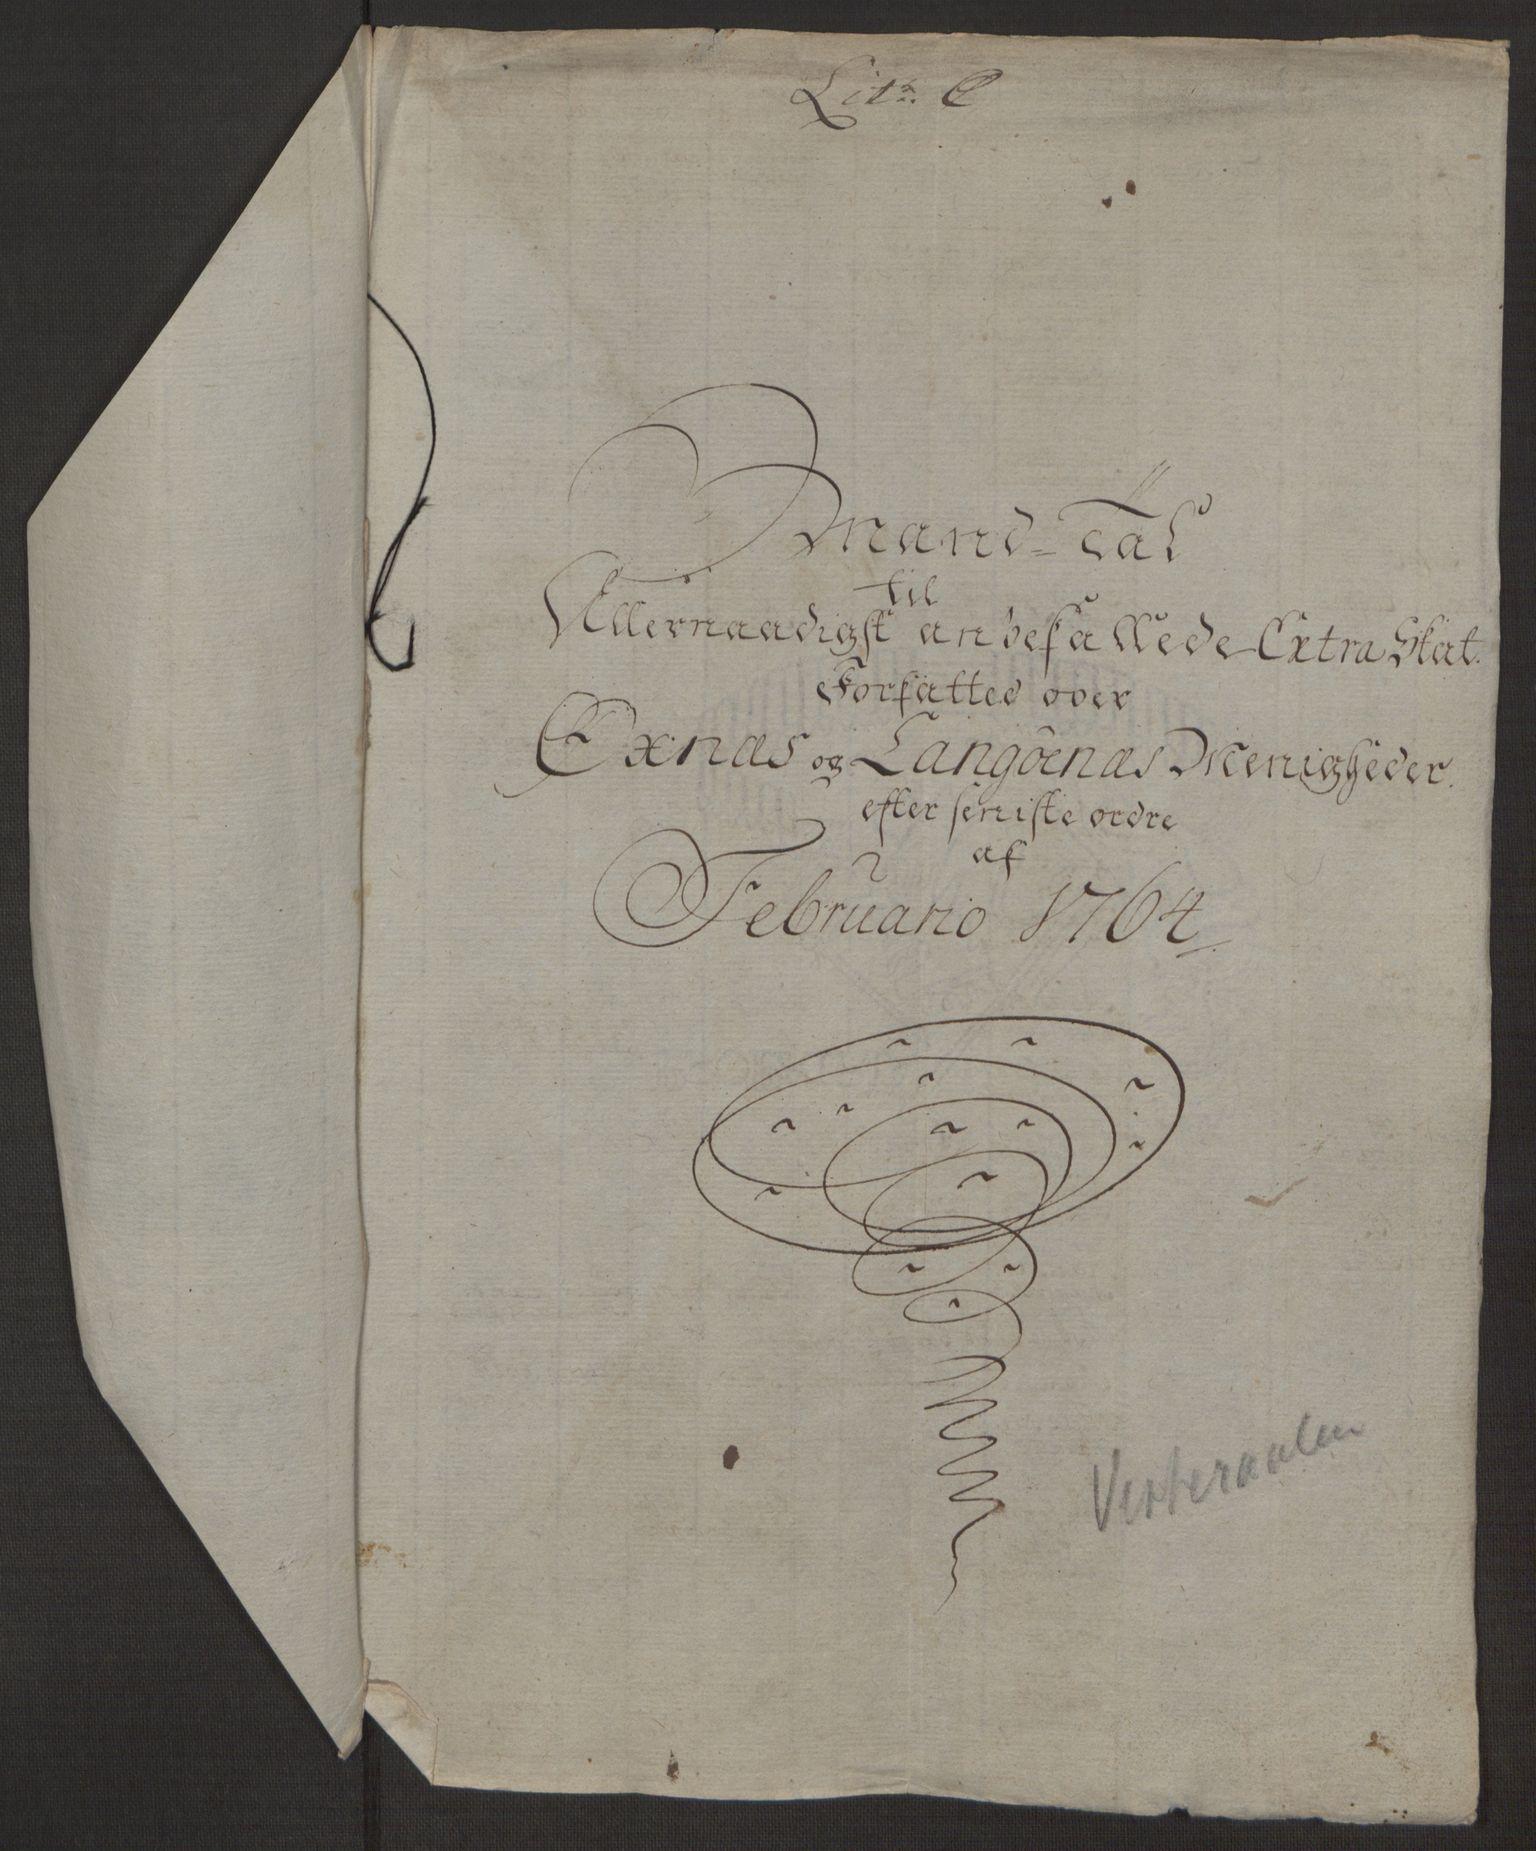 RA, Rentekammeret inntil 1814, Realistisk ordnet avdeling, Ol/L0022a: [Gg 10]: Ekstraskatten, 23.09.1762. Nordlands amt, 1763-1769, s. 79